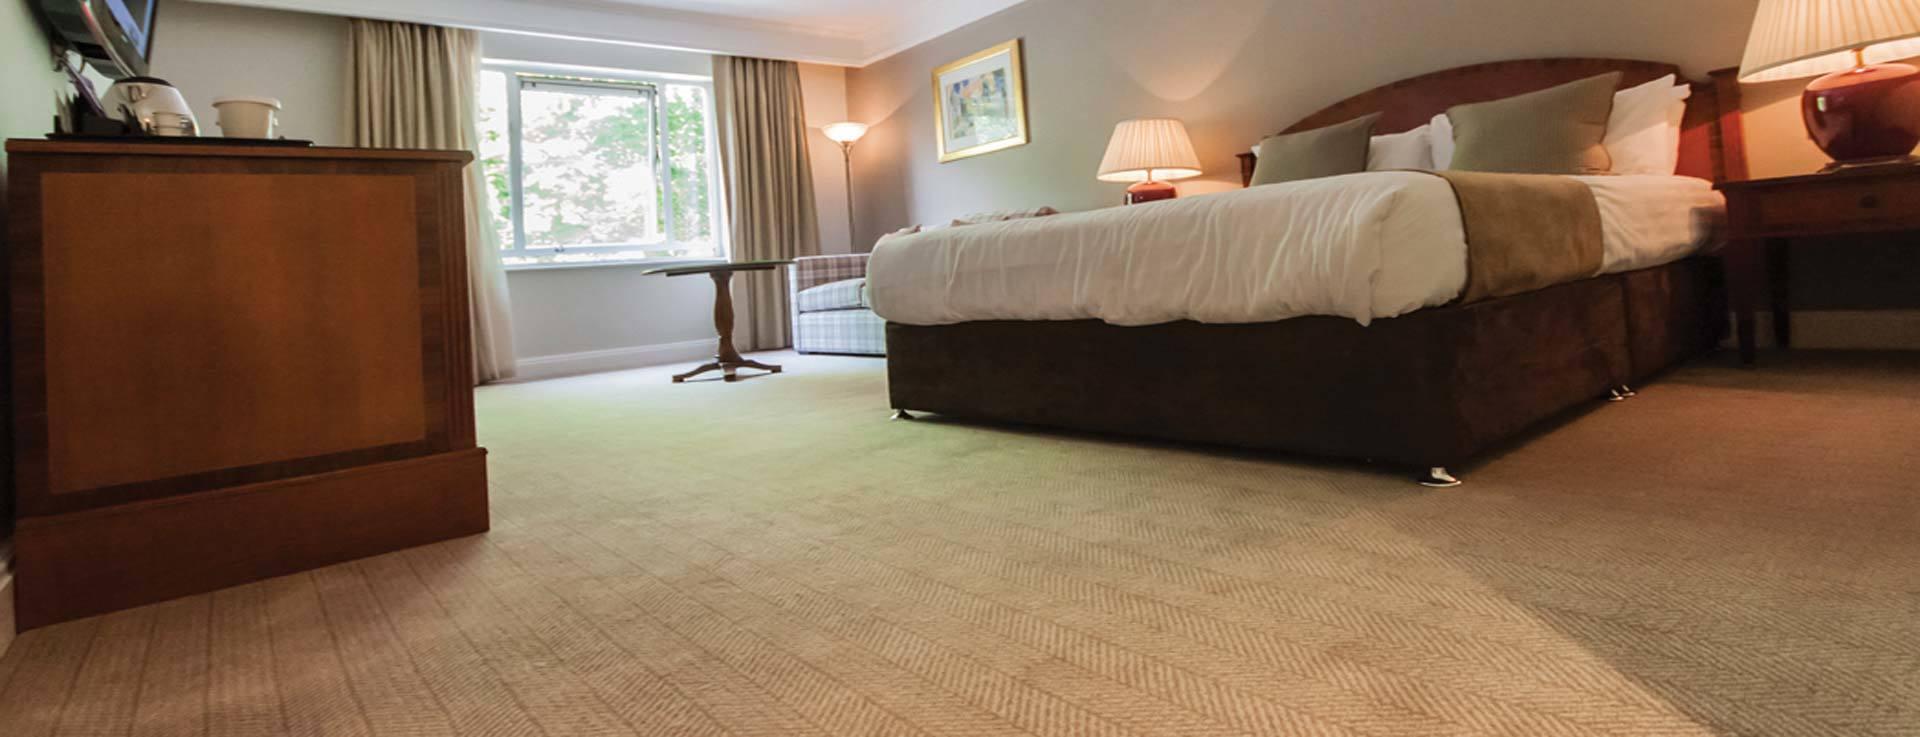 hotel banquet carpet manufacturer-min